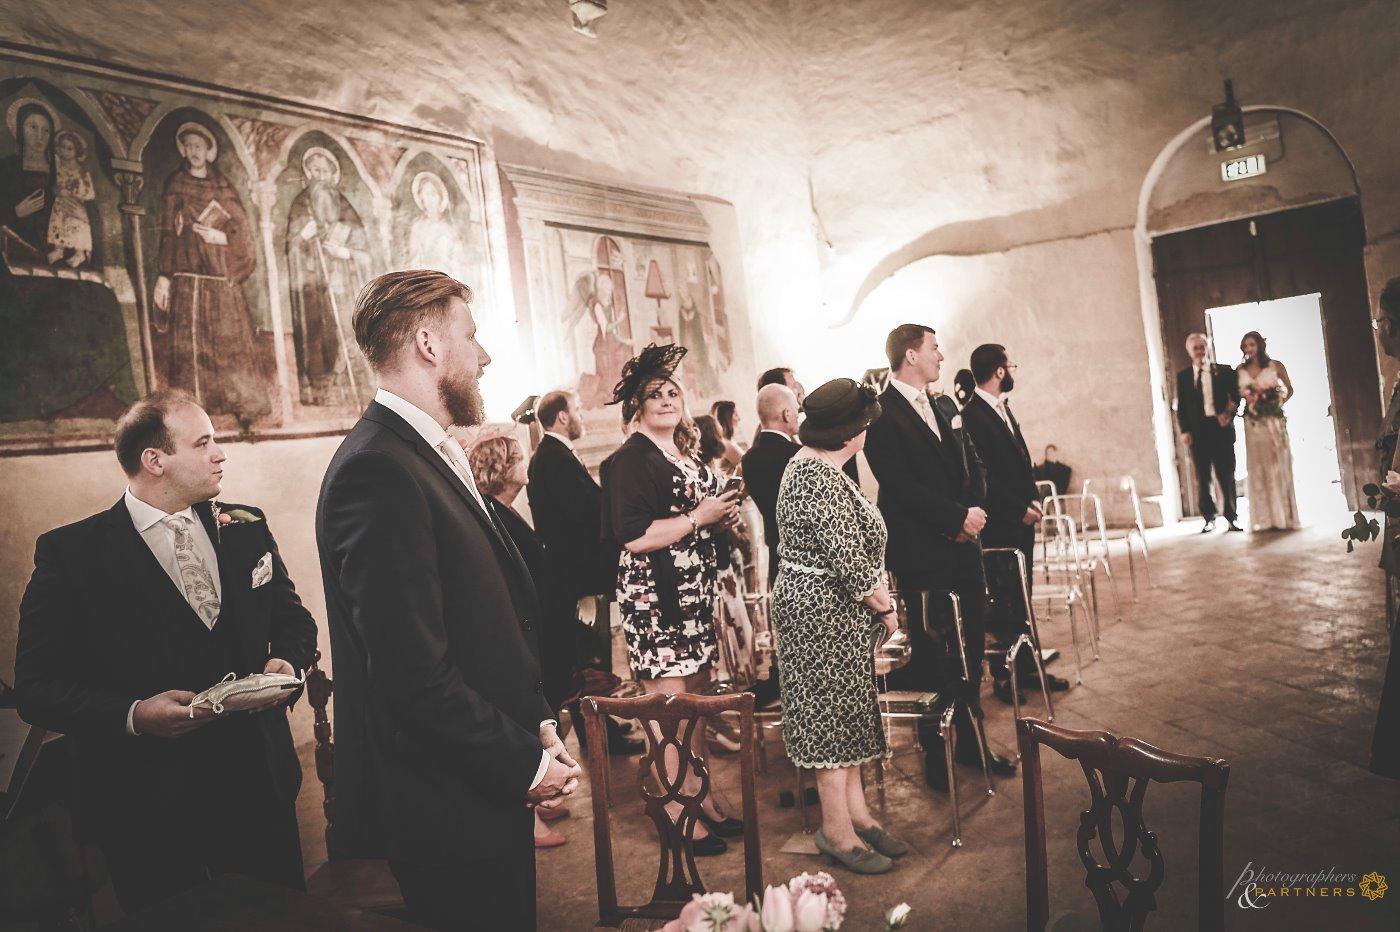 photos_weddings_castello_oliveto_08.jpg